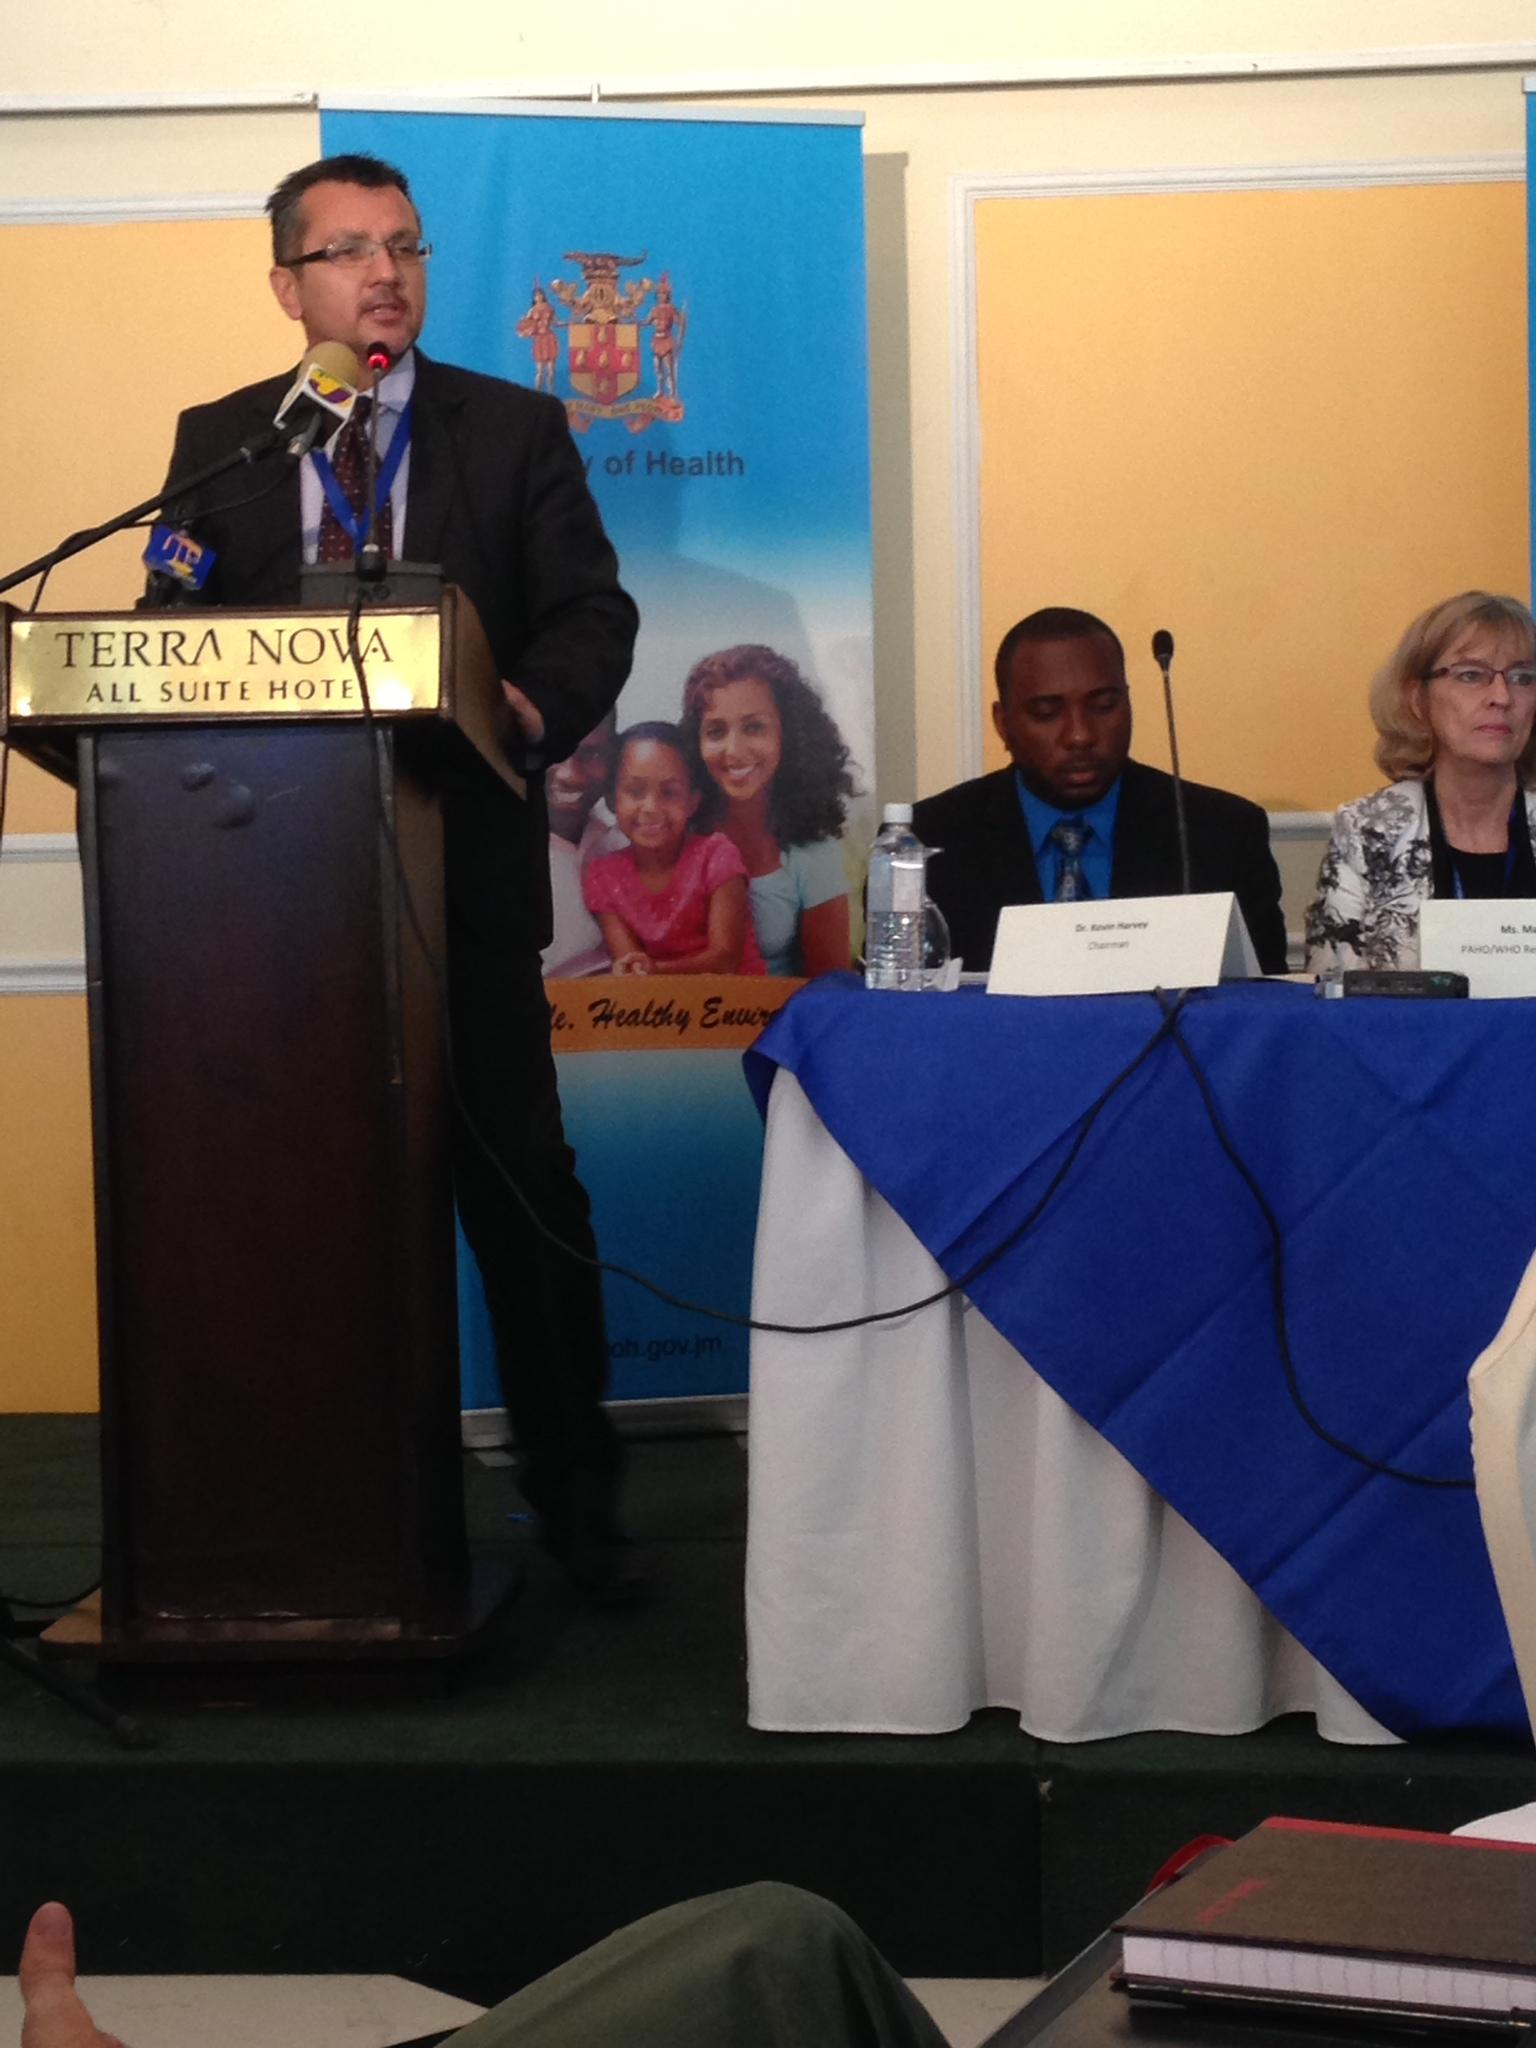 Dr Tibor Szilagyi addressing the stakeholder meeting